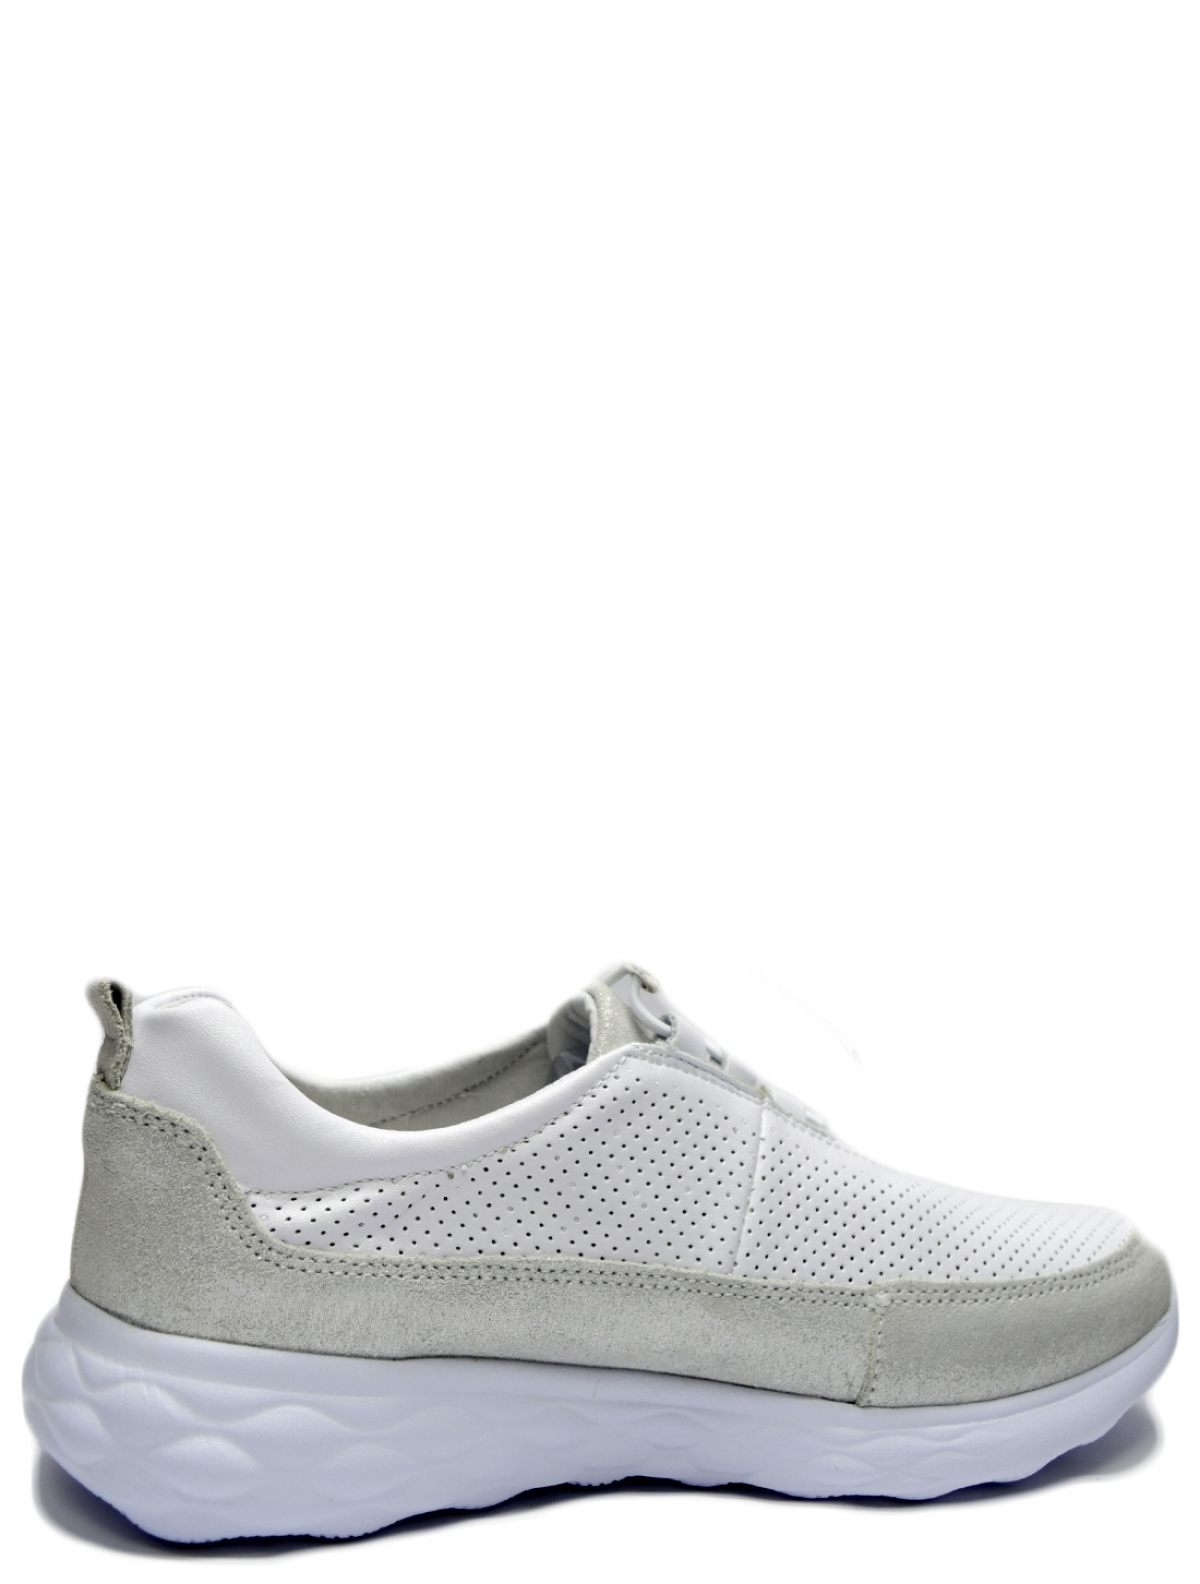 D*Oro S9F14-01-01 женские кроссовки